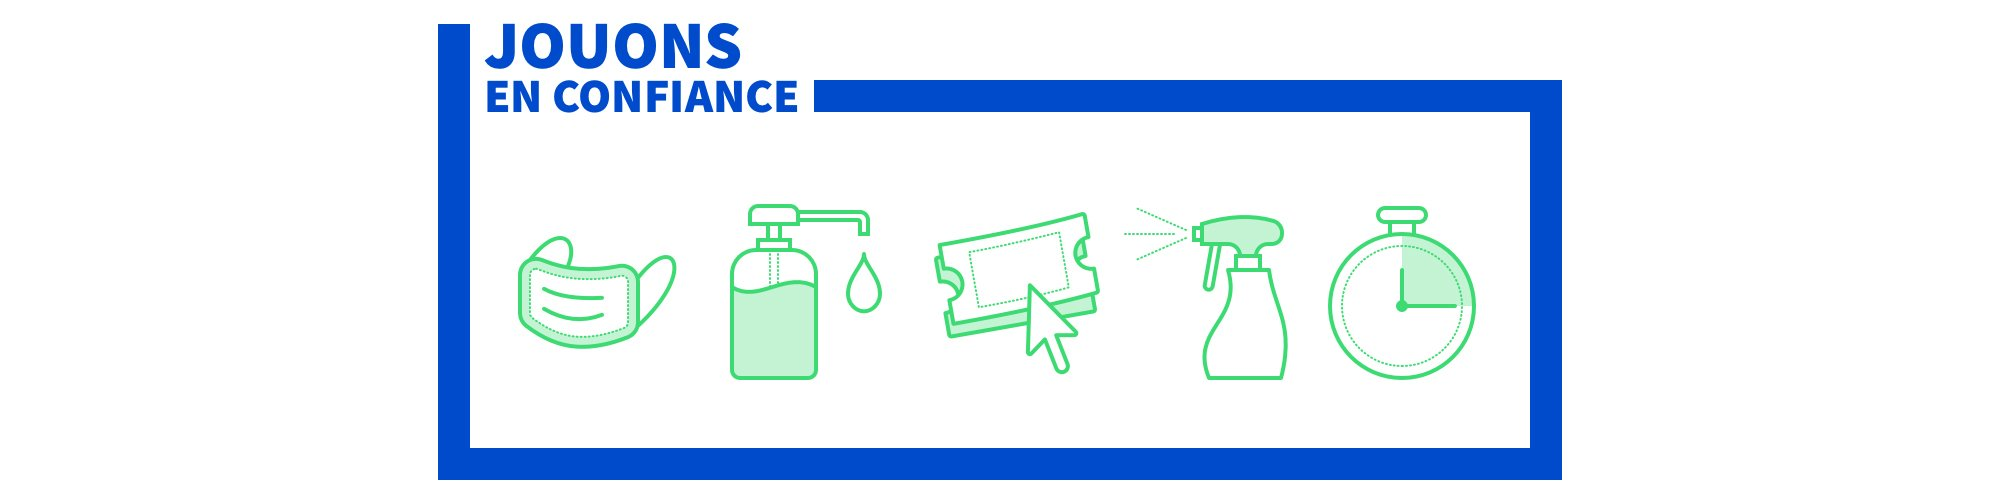 mesure sanitaire covid 19.jpg